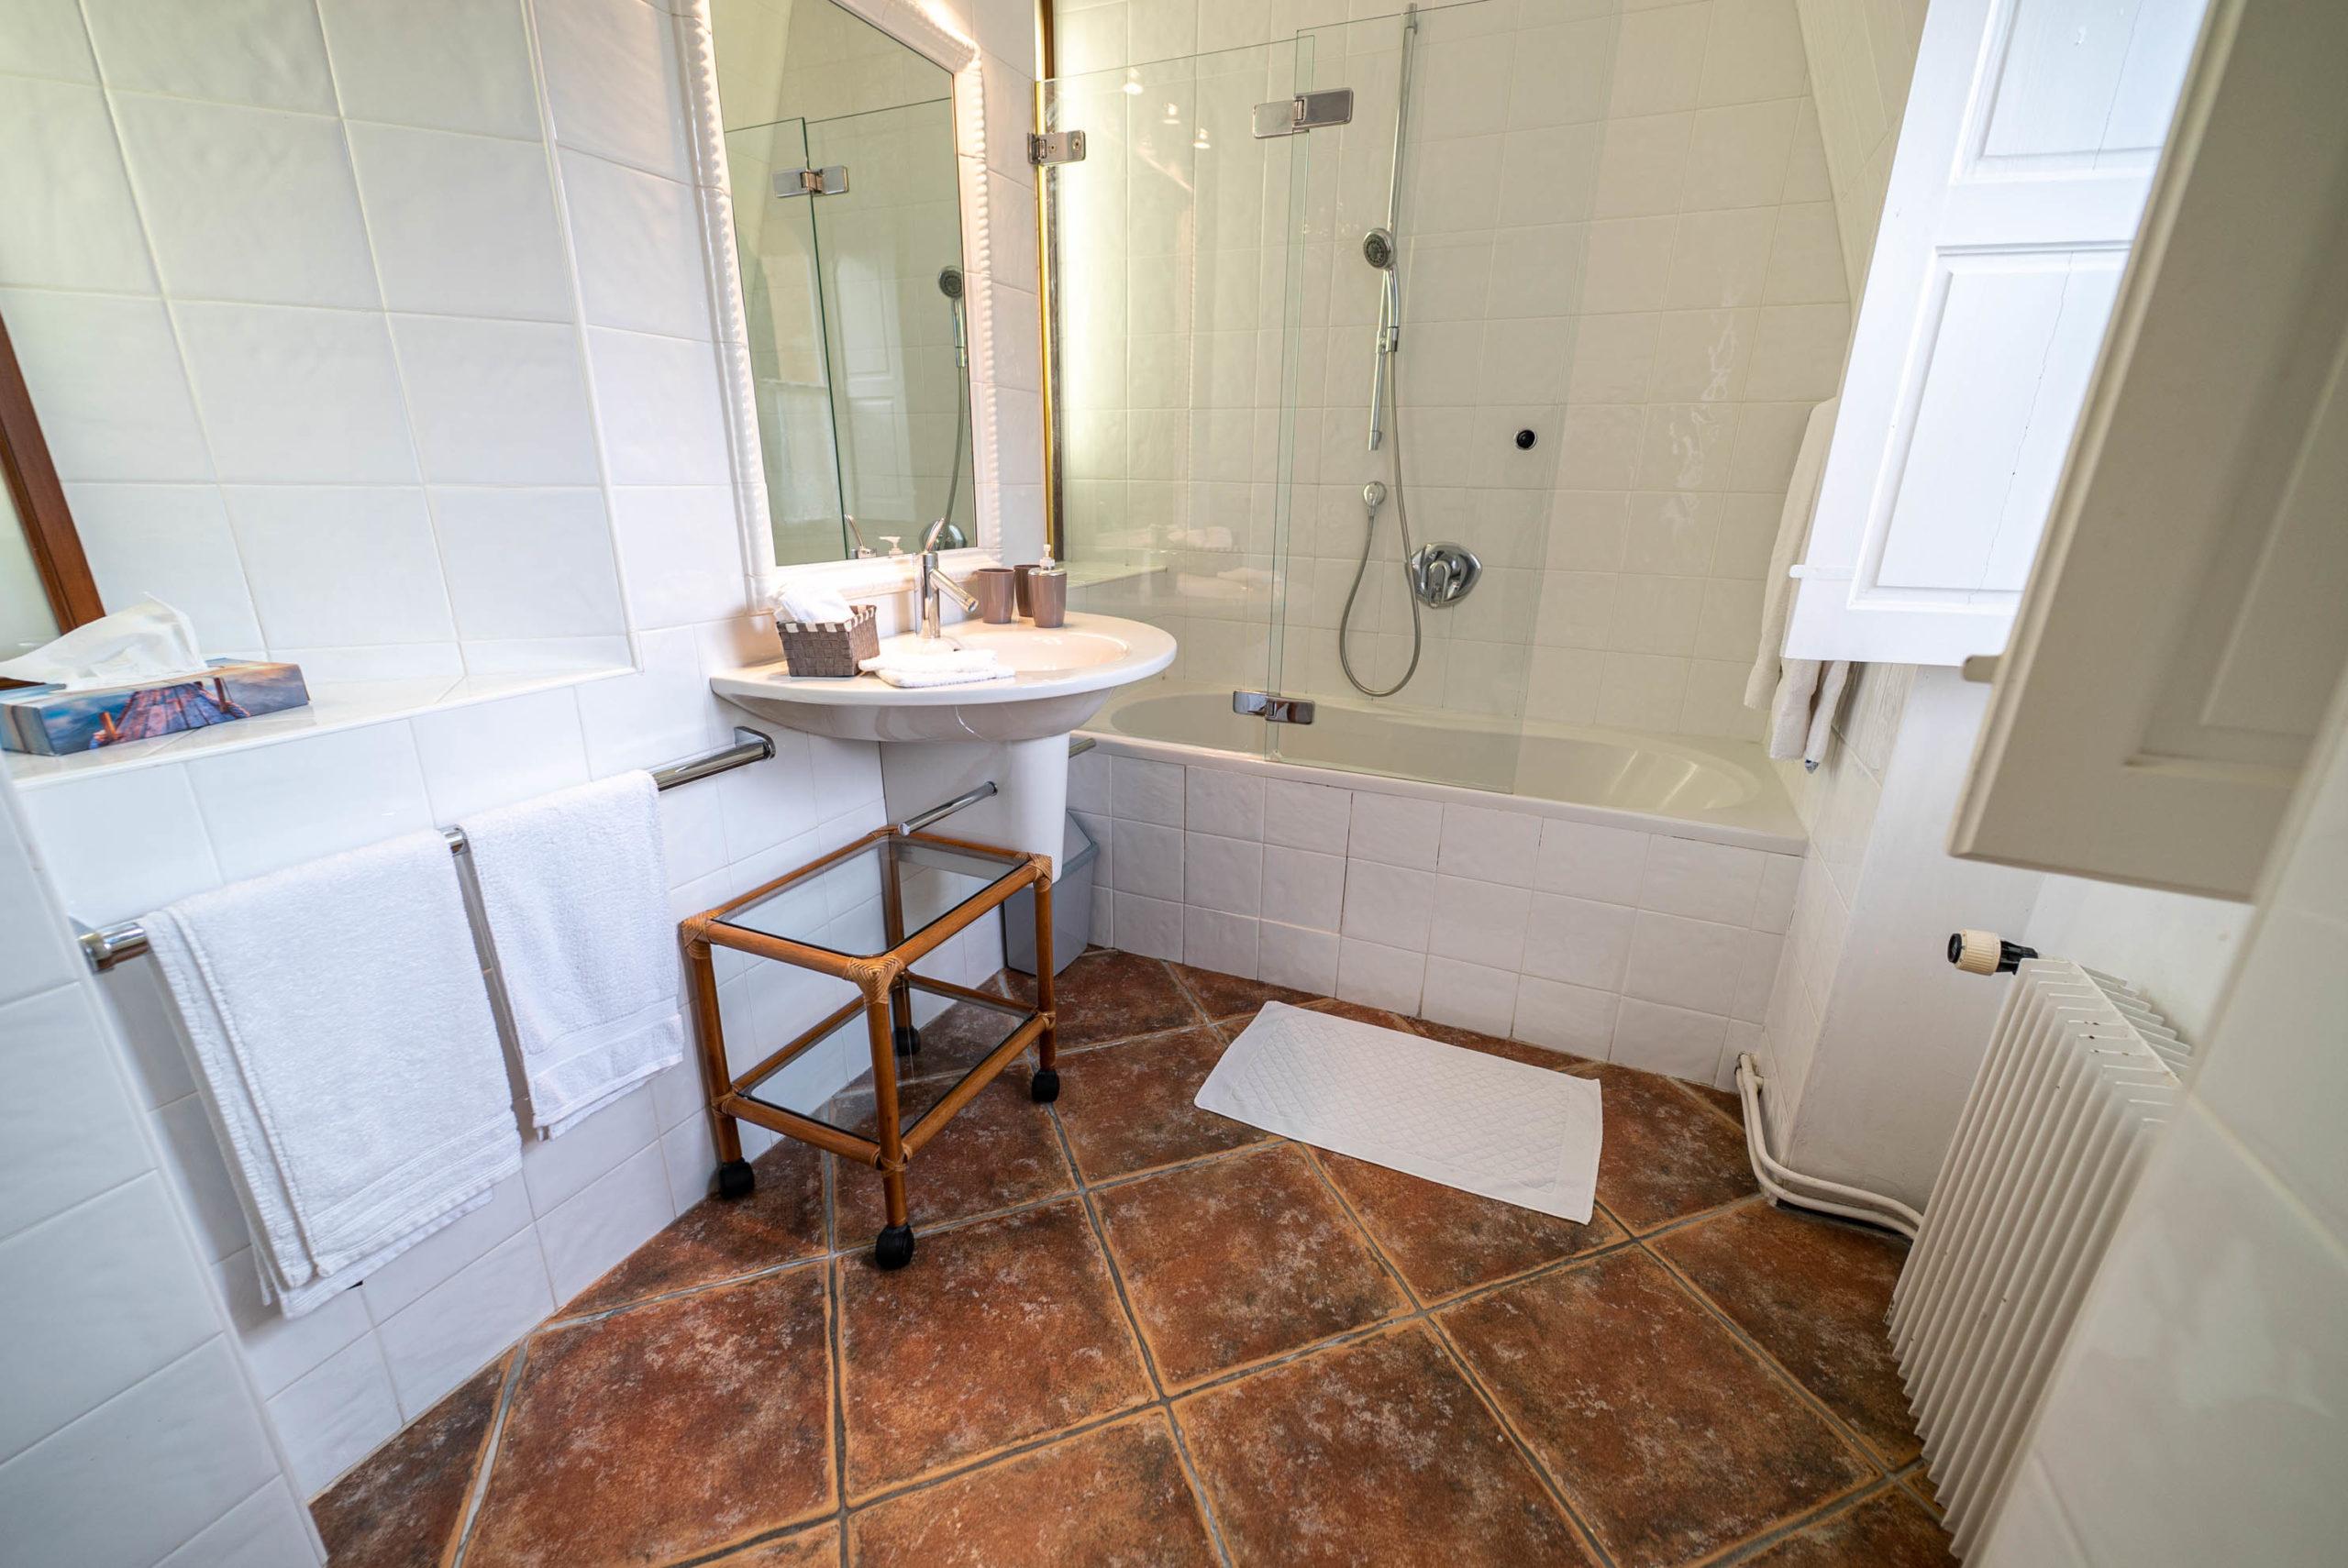 Salle de bain suite nuptiale chateau Rauly location bergerac Monbazillac